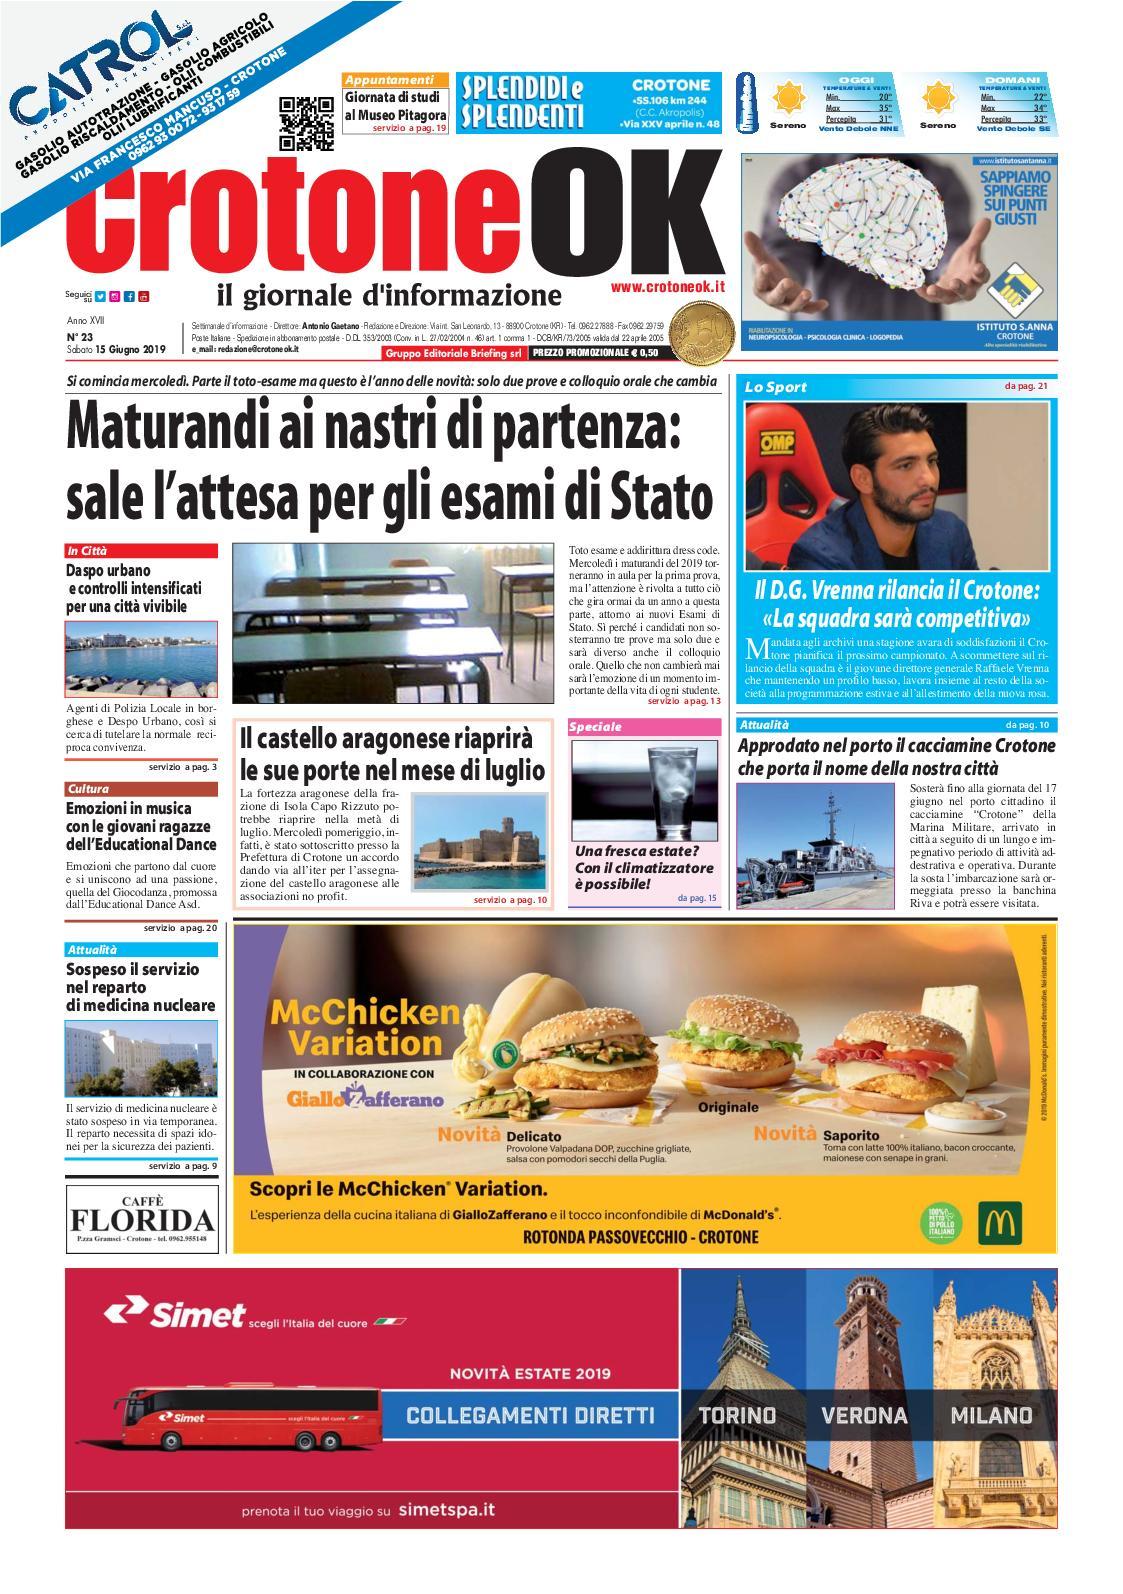 84257dfc4e Calaméo - Giornale CrotoneOk N° 23 / 2019